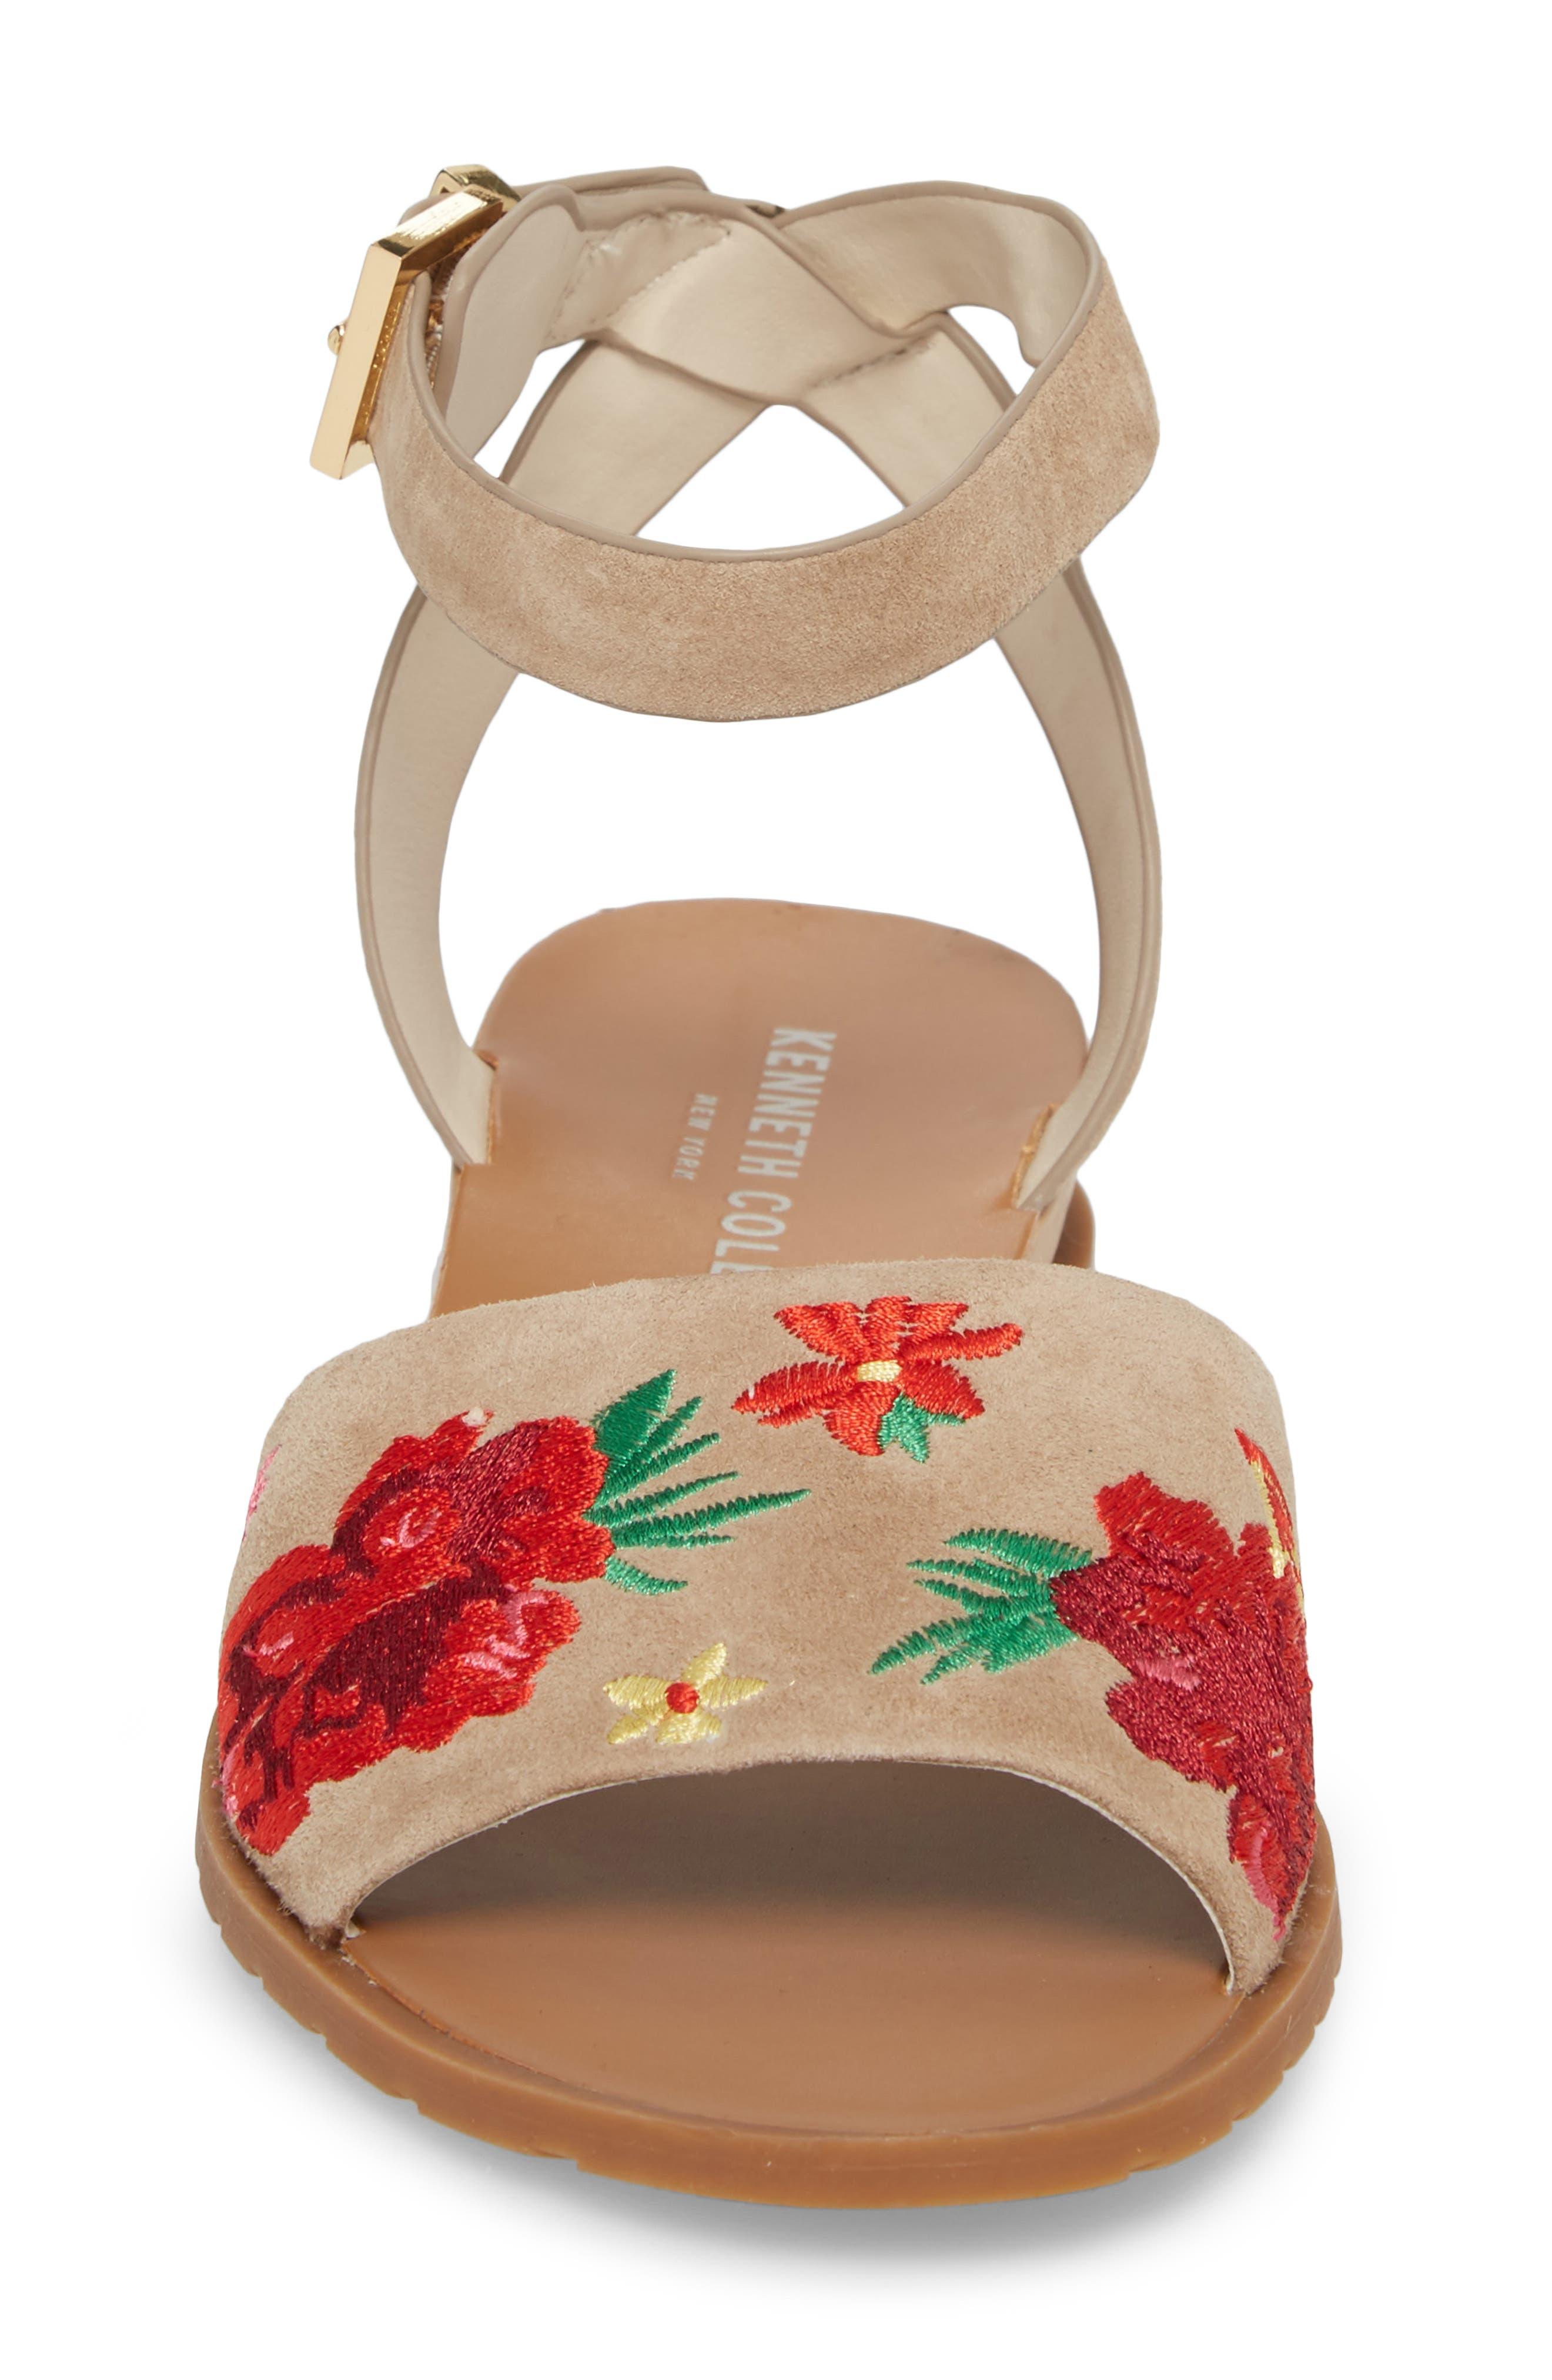 Jinny Ankle Strap Sandal,                             Alternate thumbnail 4, color,                             250